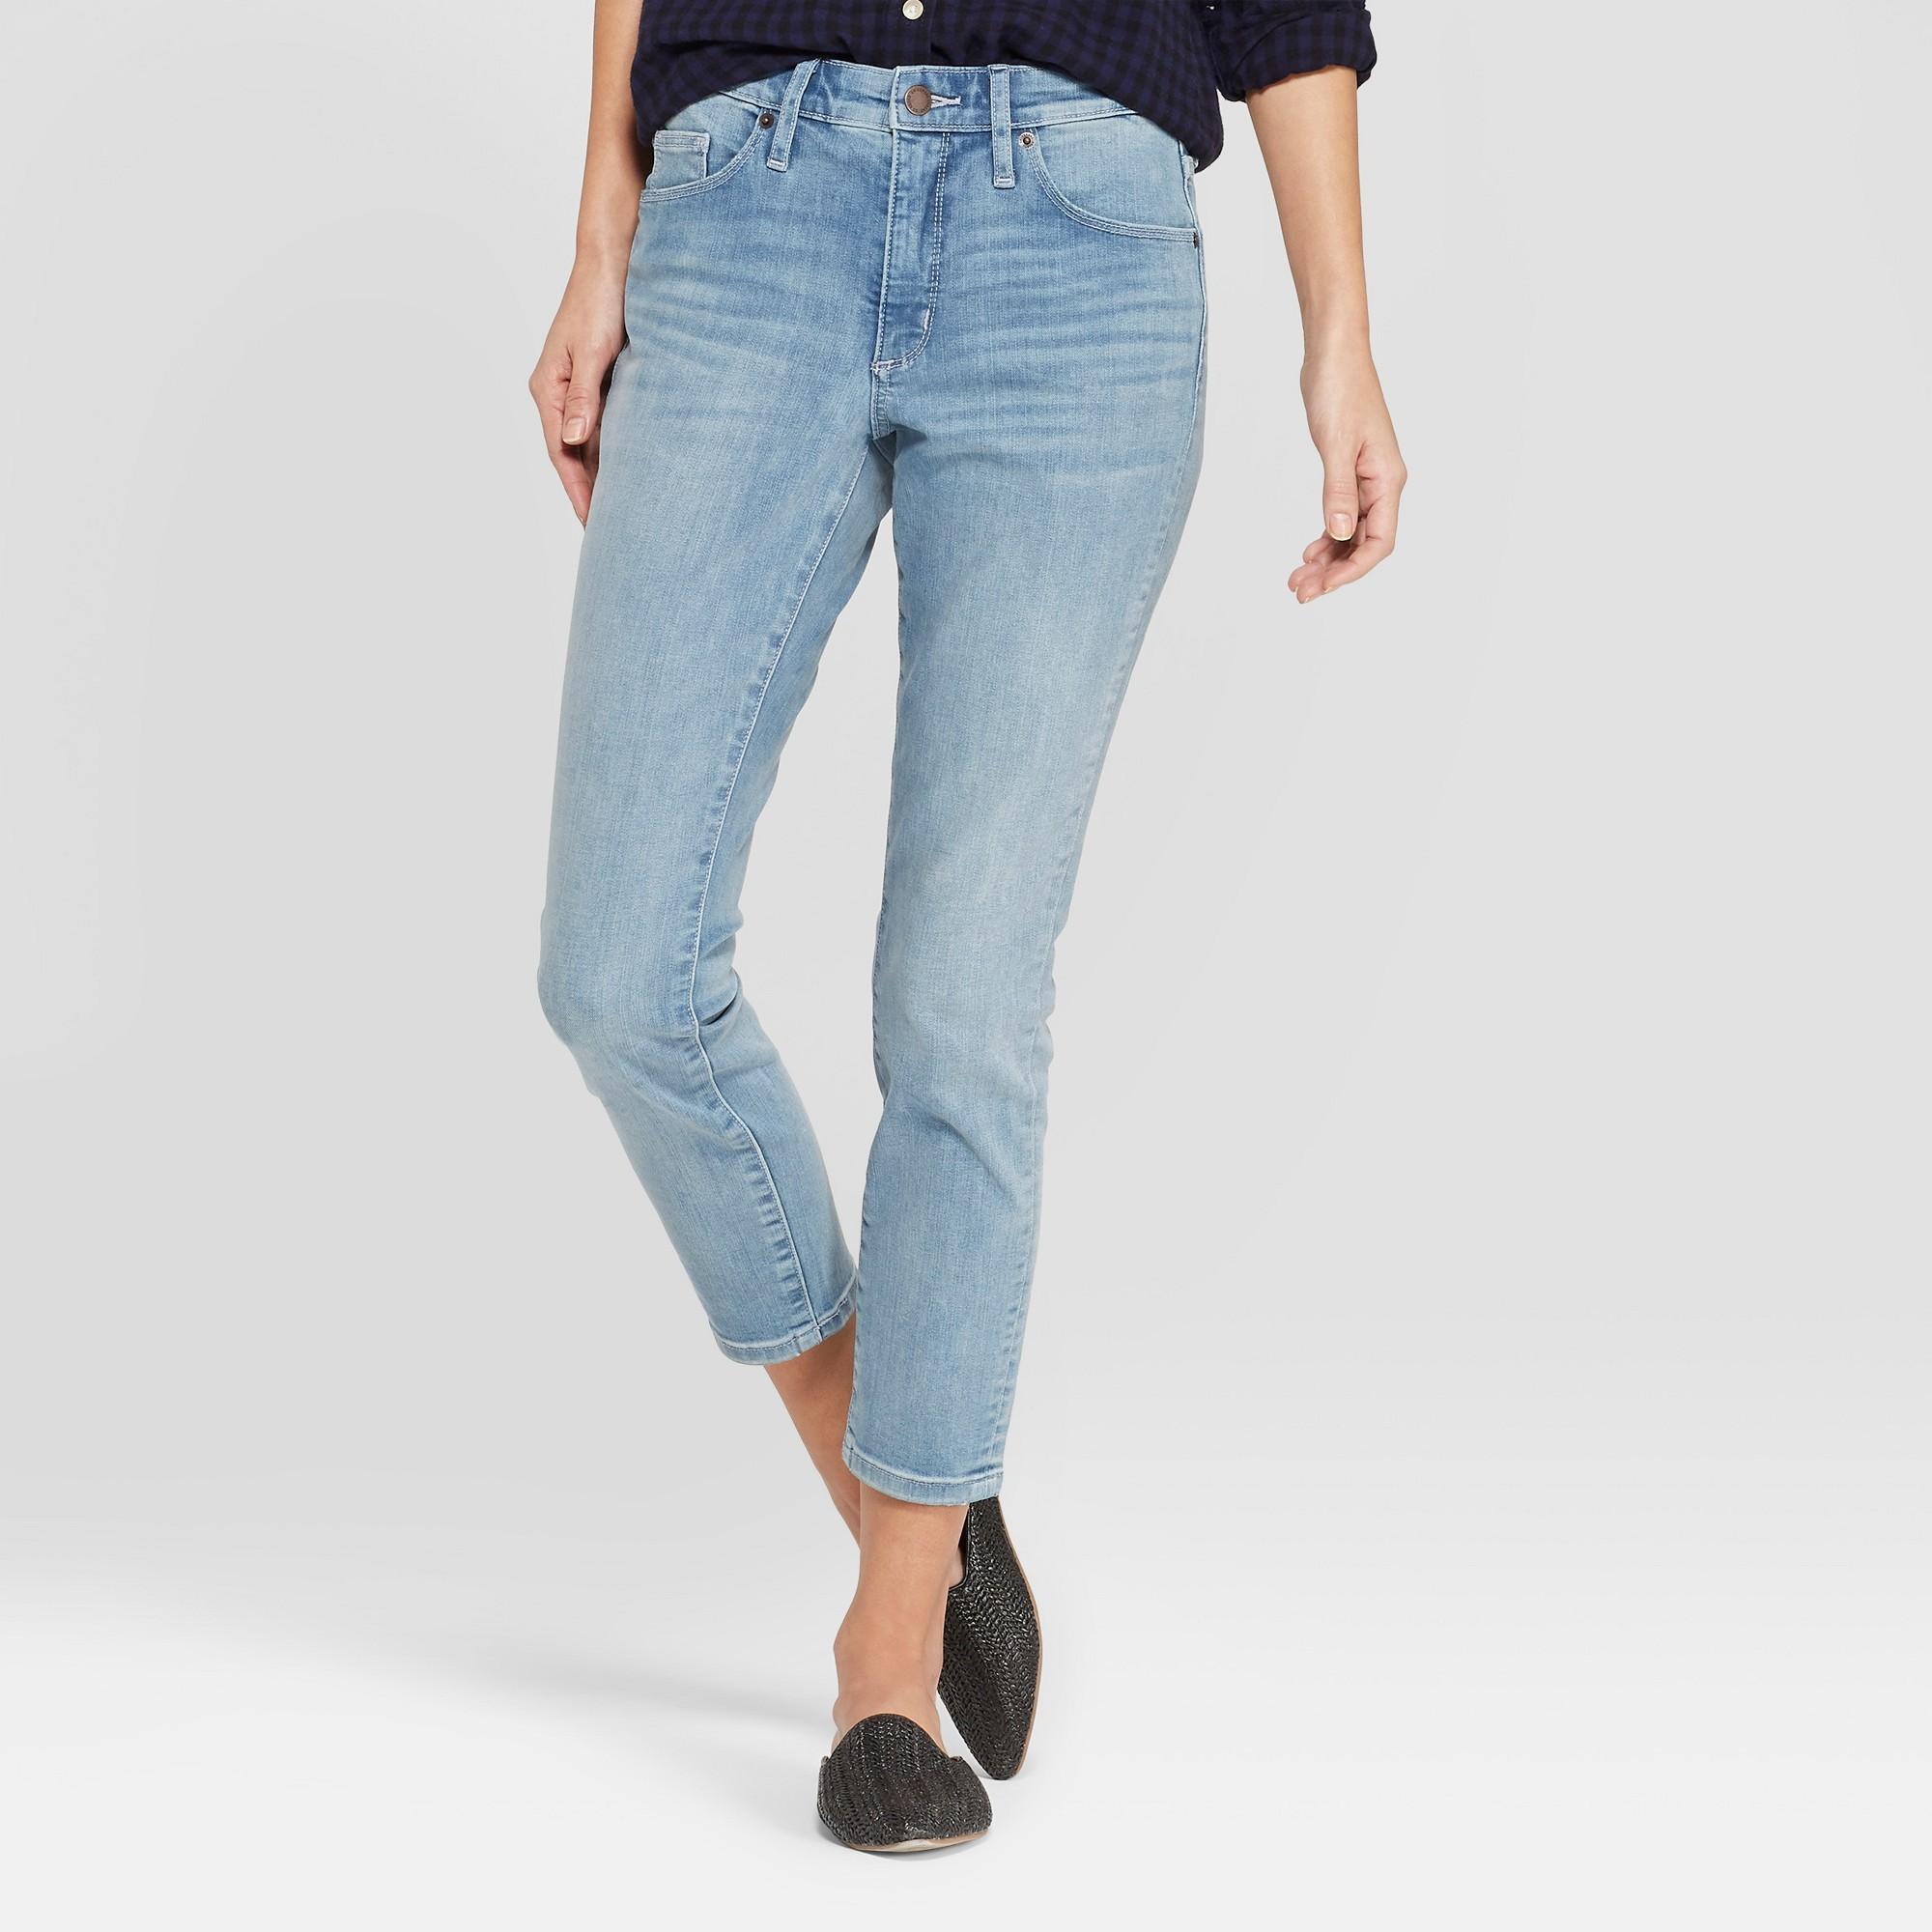 4da67654b39 Women s High-Rise Skinny Crop Jeans - Universal Thread Dark Wash 12 ...